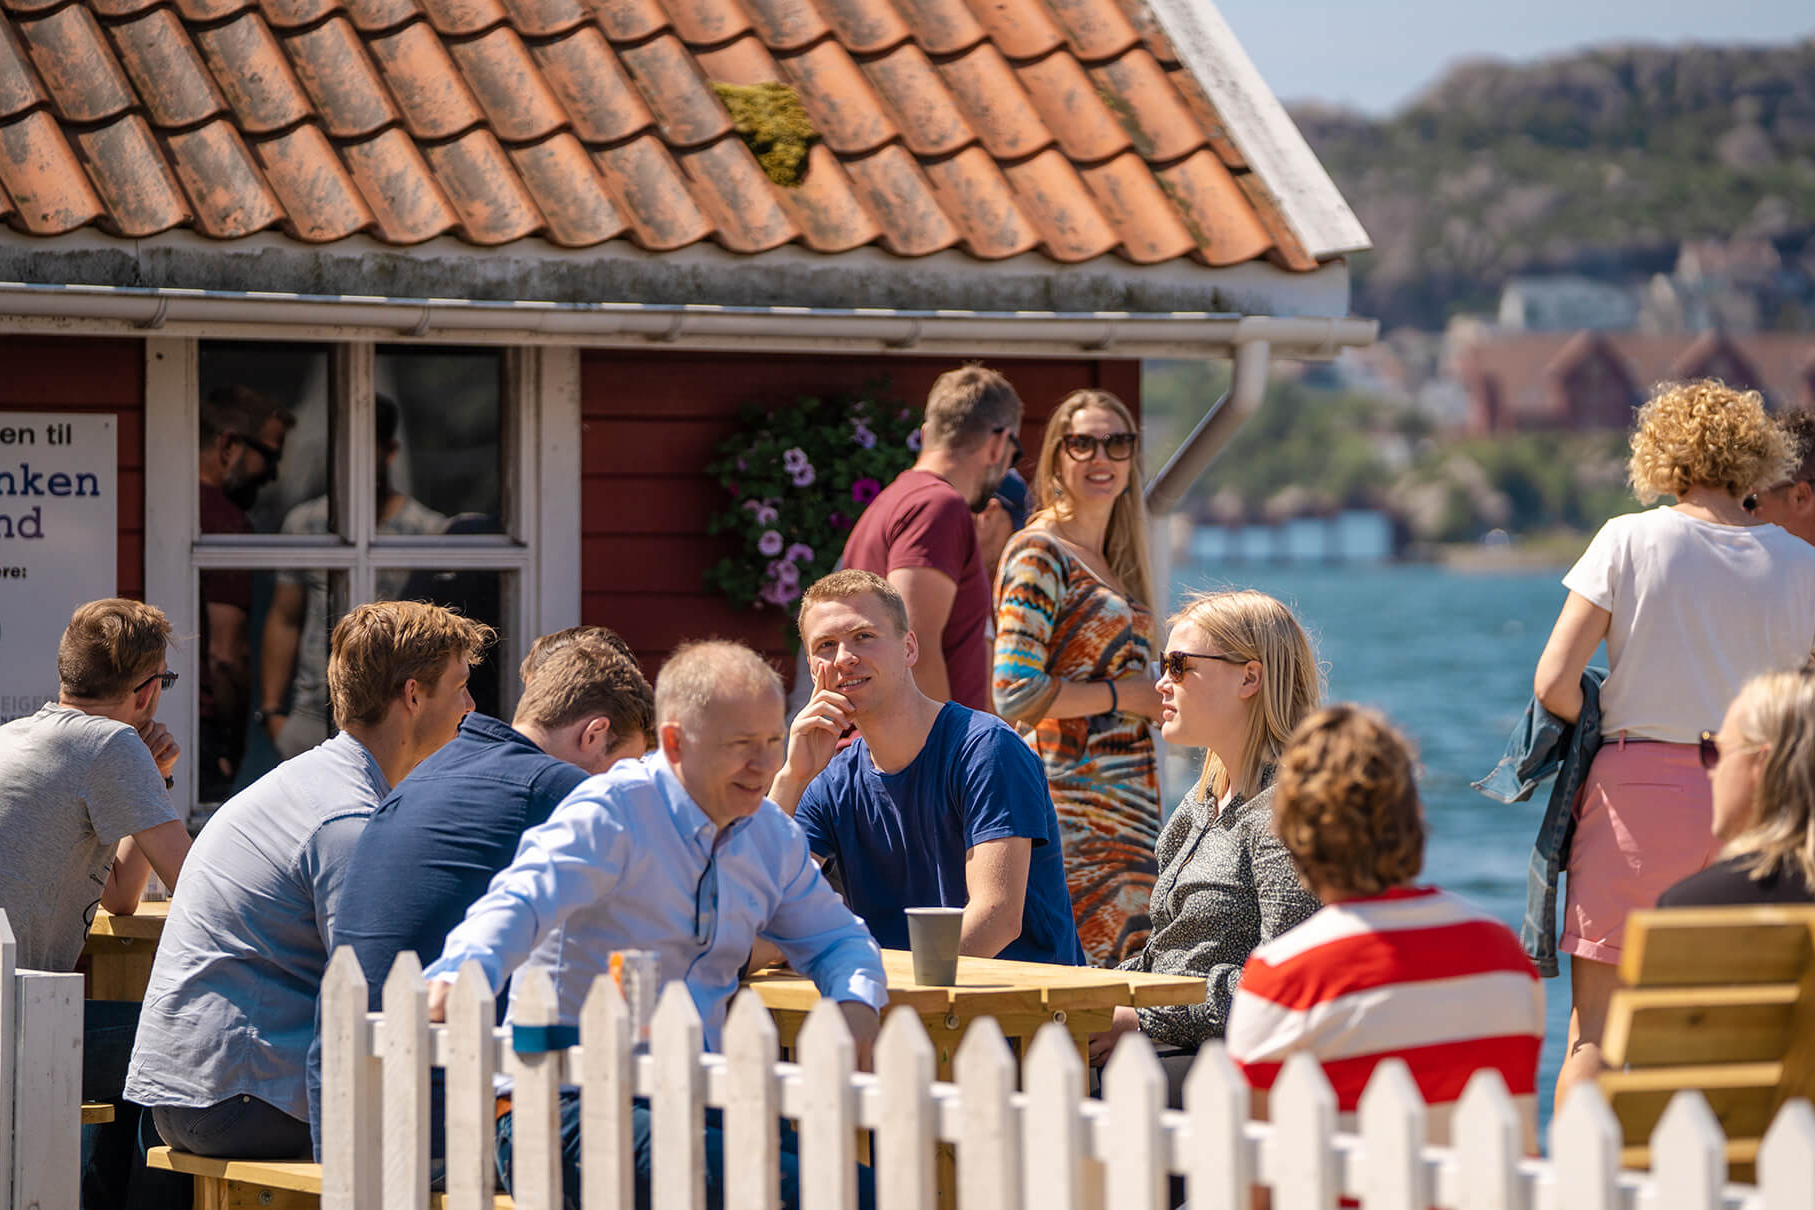 Heidi Herredsvela Gravdal, Stine Nordbø Grimsrud, Gudrun Ellingsen